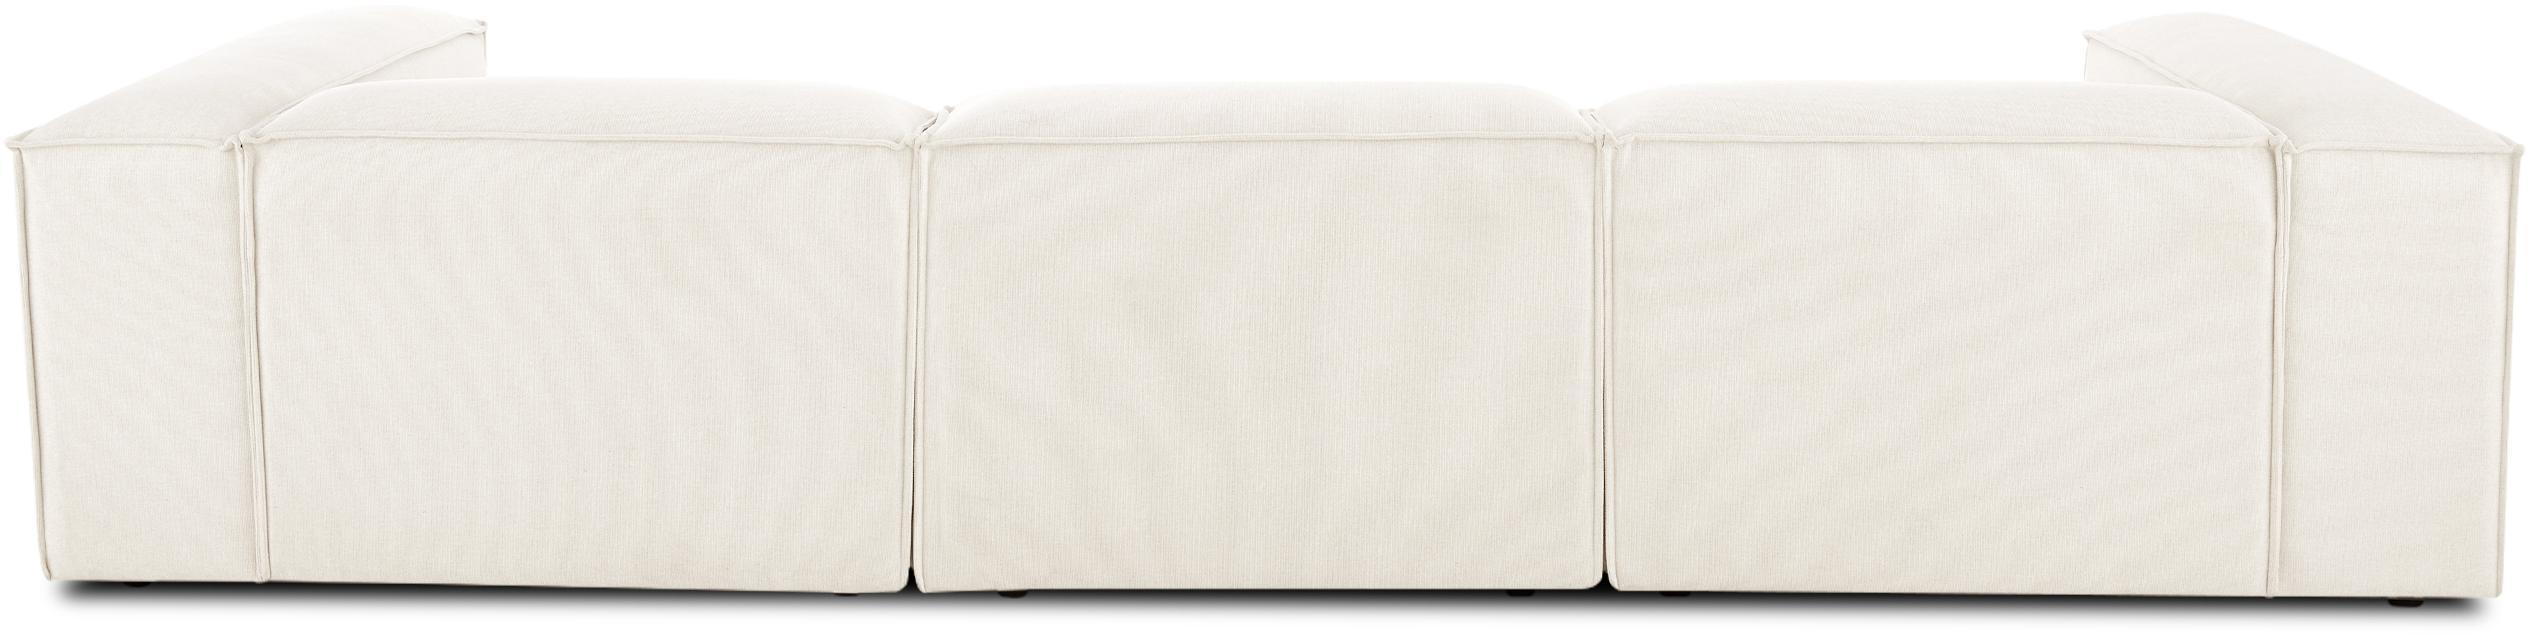 Modulares Ecksofa Lennon, Bezug: Polyester 35.000 Scheuert, Gestell: Massives Kiefernholz, Spe, Füße: Kunststoff, Webstoff Beige, B 326 x T 207 cm